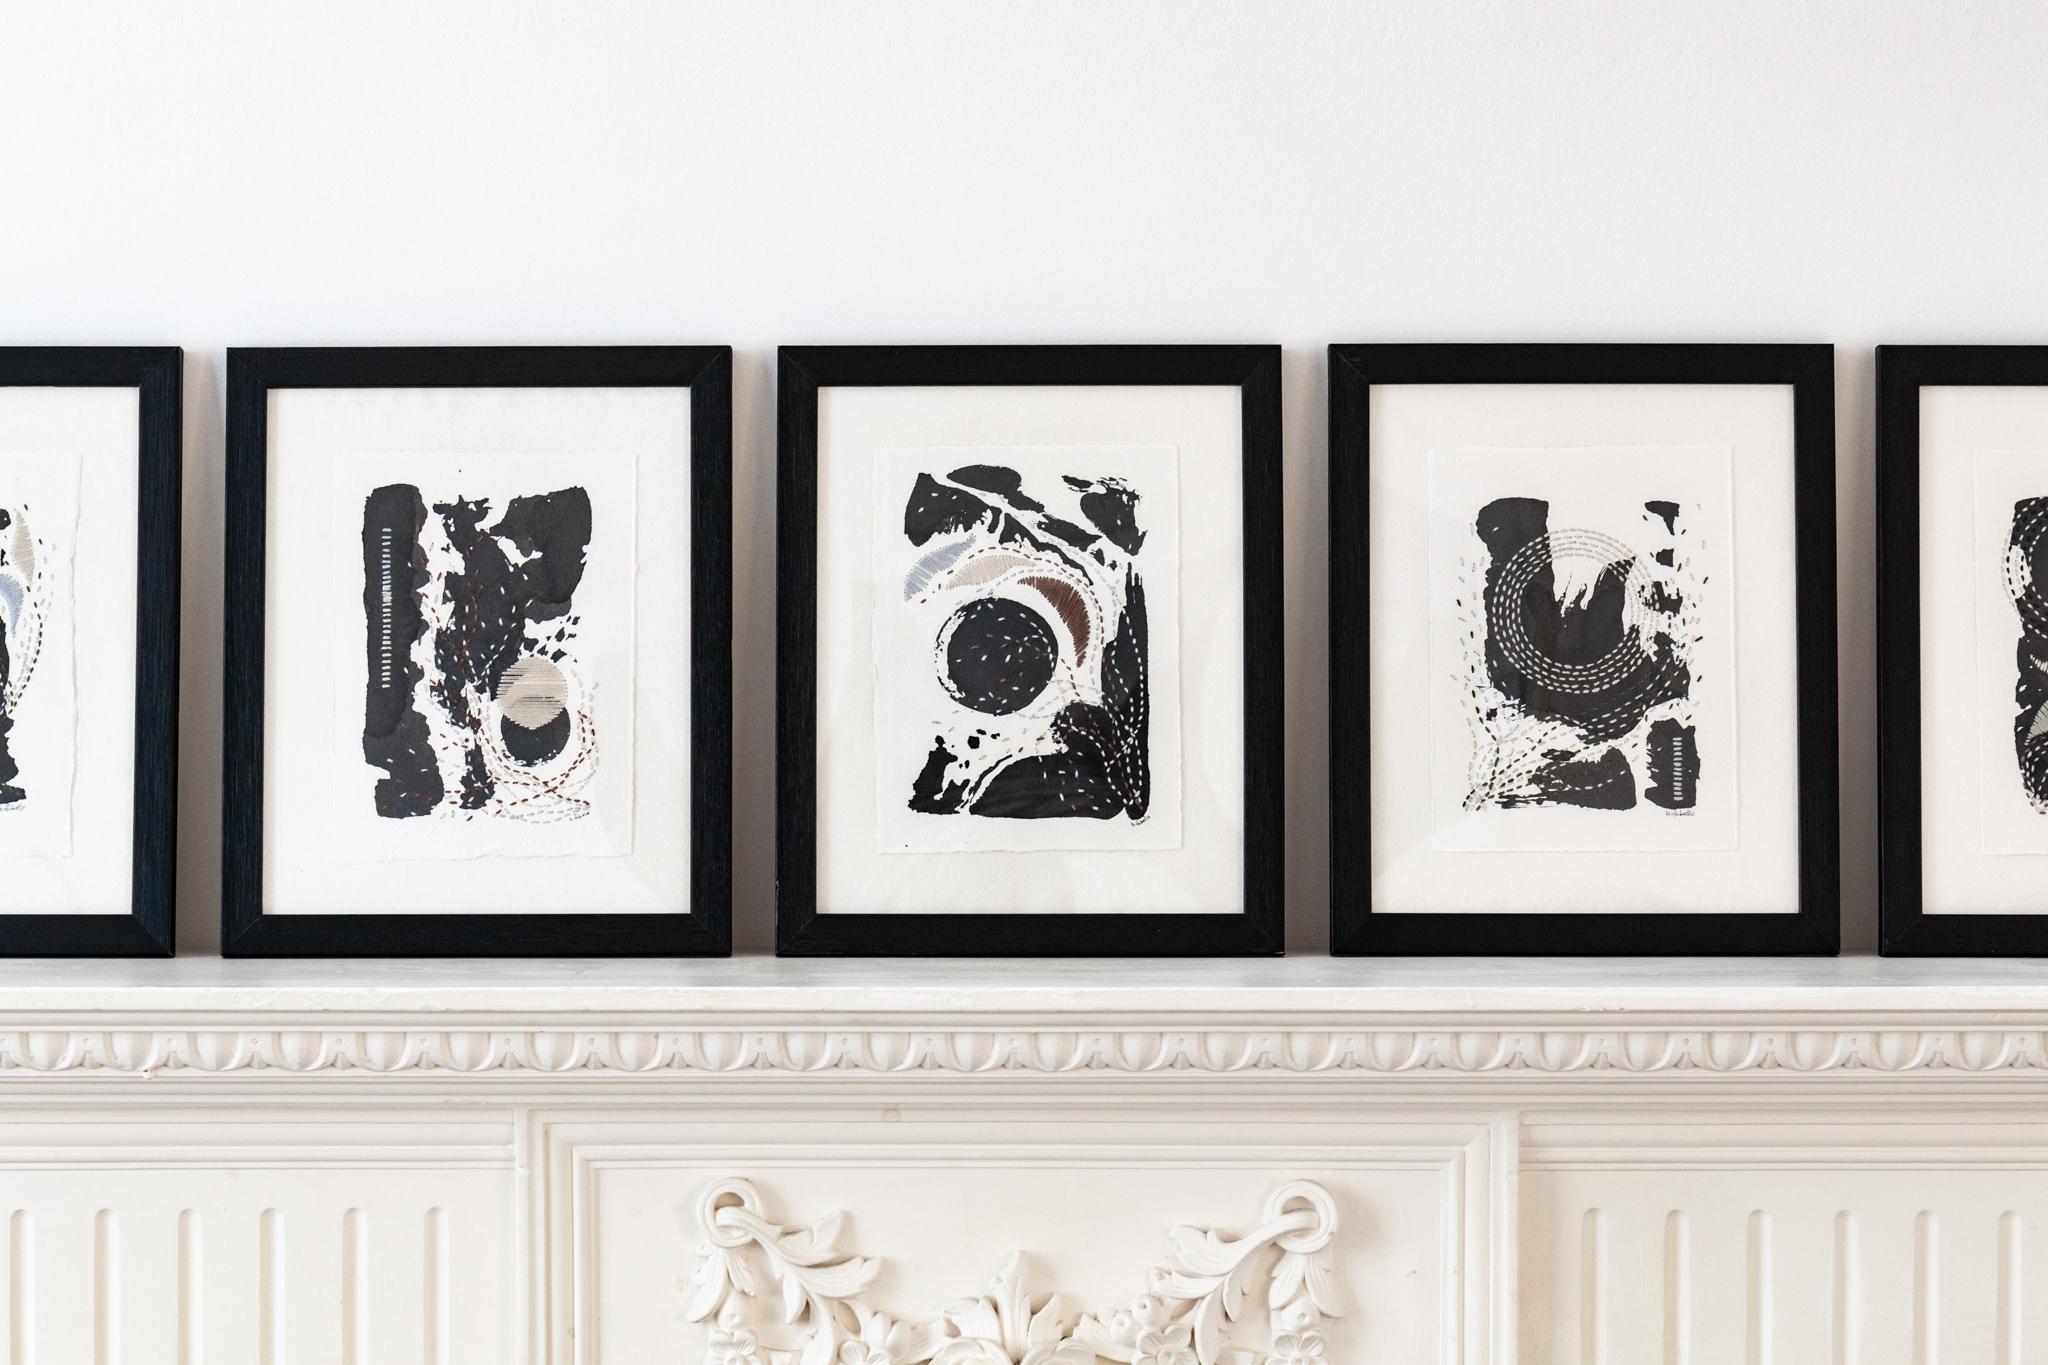 The Movement Series by Britt Fabello